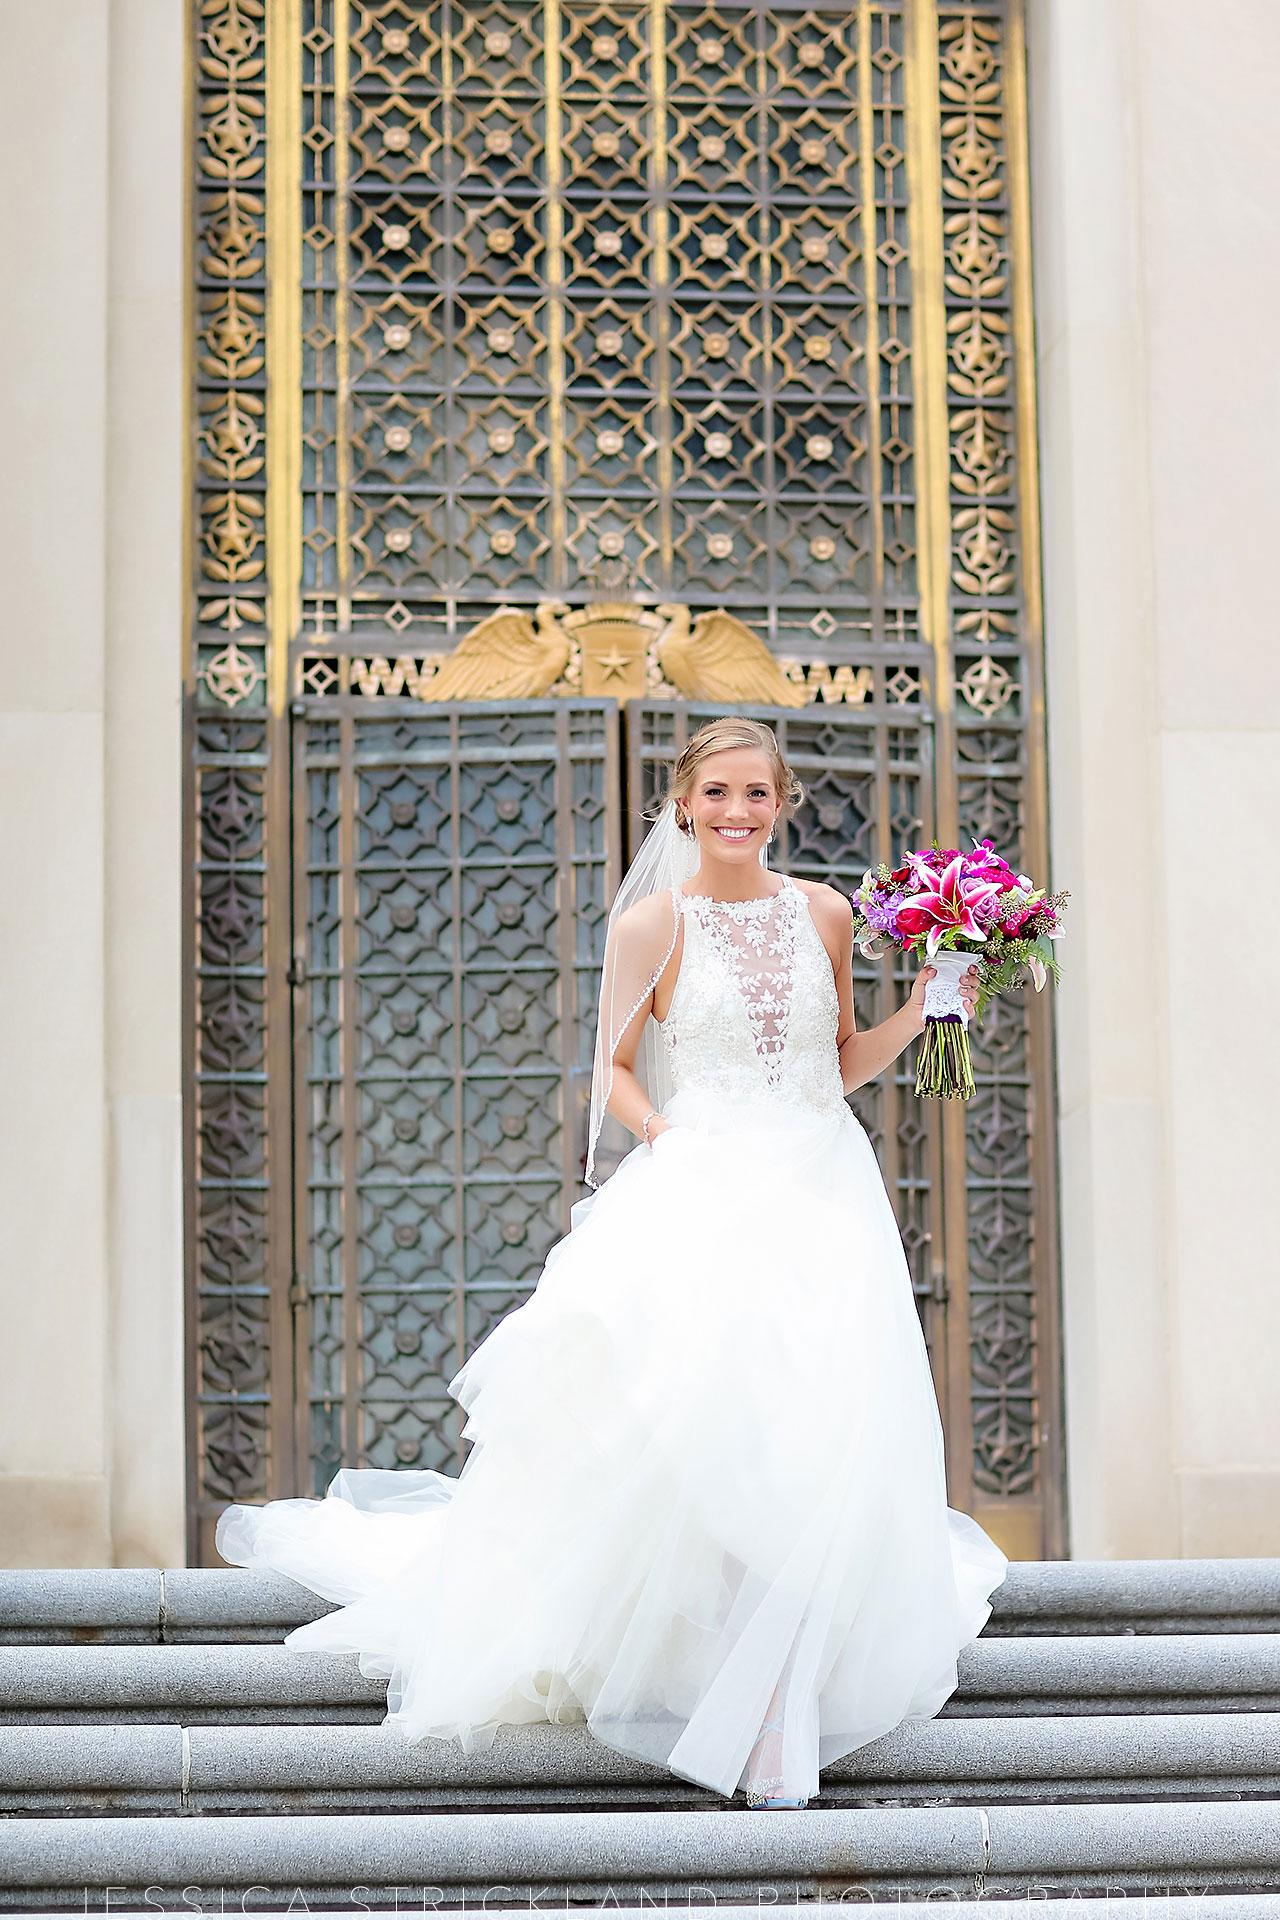 Serra Alex Regions Tower Indianapolis Wedding 117 watermarked